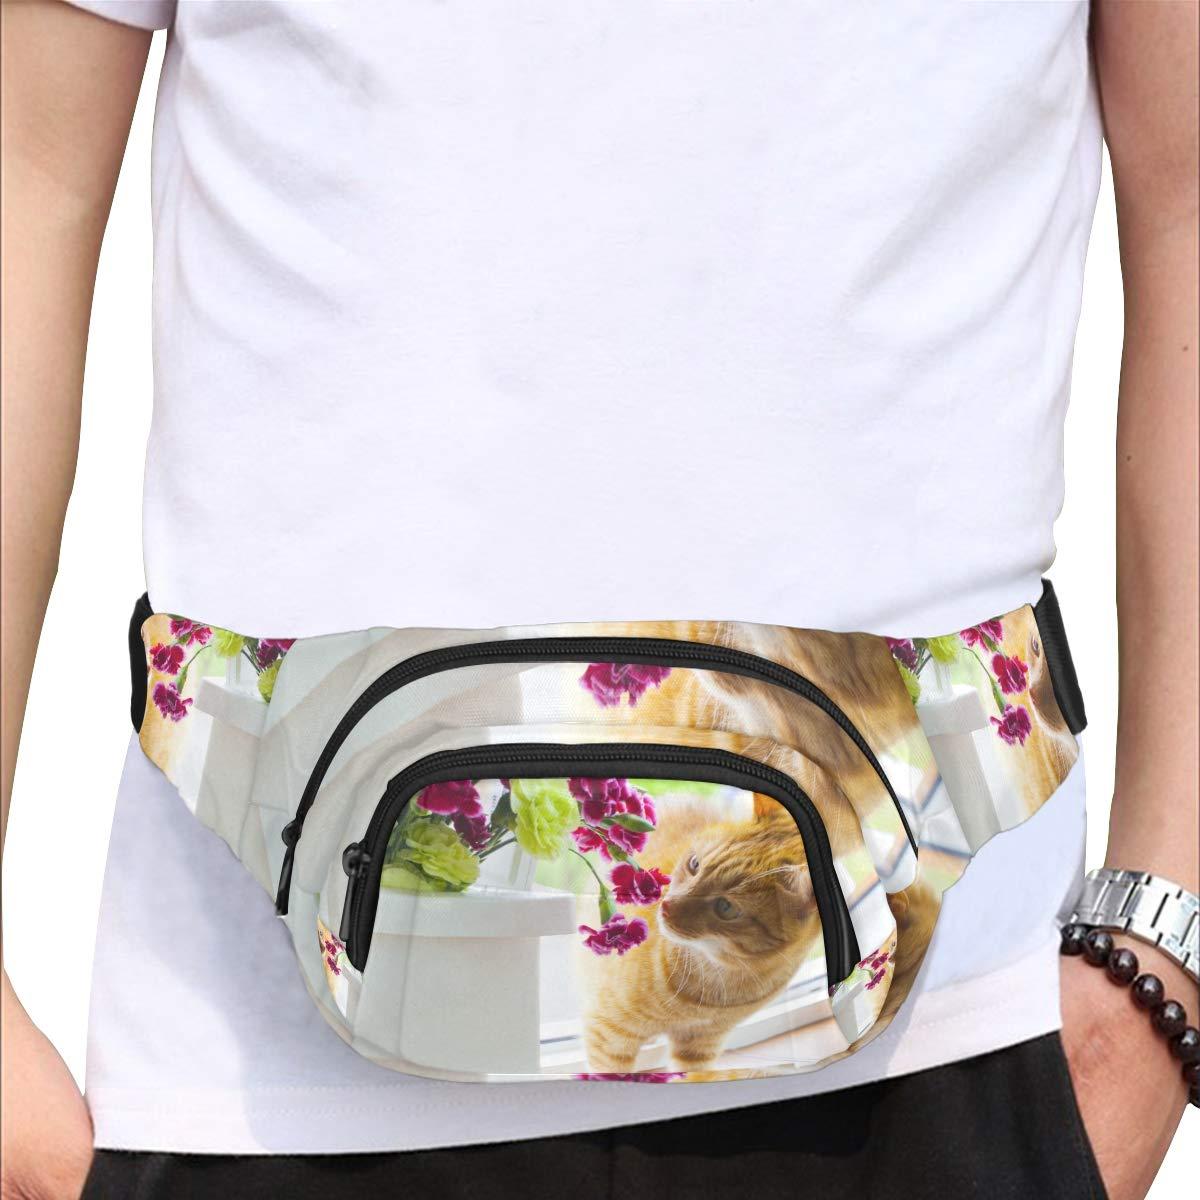 Cat Smell Of Beautiful Flower Fenny Packs Waist Bags Adjustable Belt Waterproof Nylon Travel Running Sport Vacation Party For Men Women Boys Girls Kids